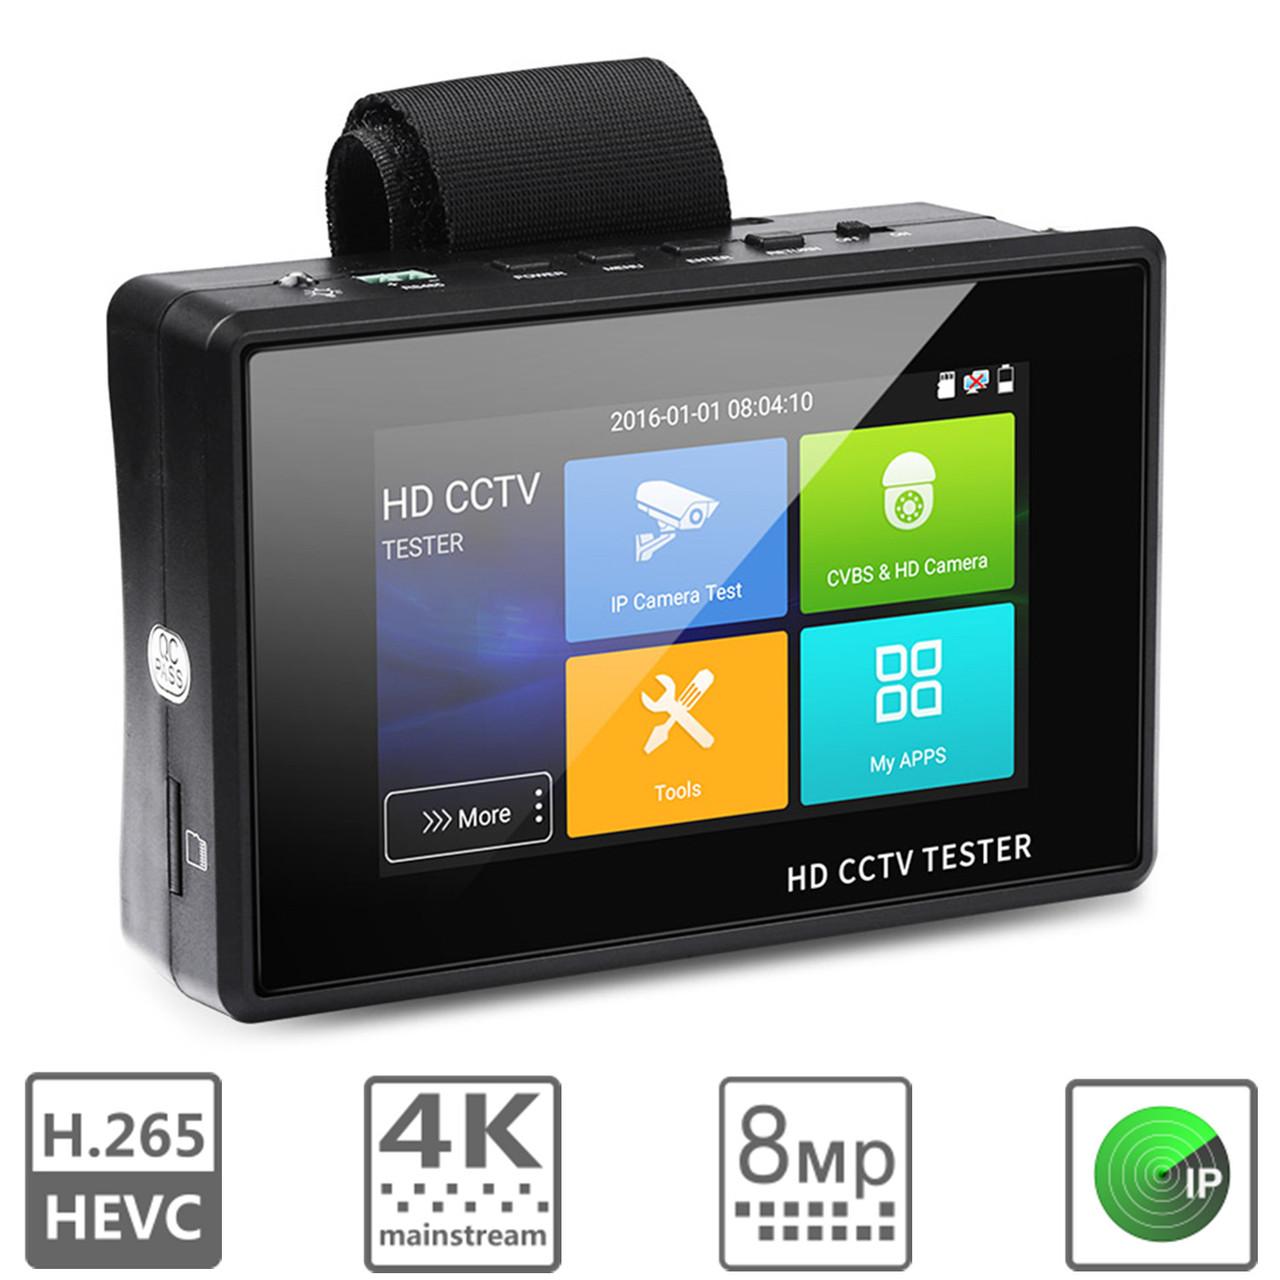 CCTV тестер відеосигналу мотитор манжета IPC-1800ADH Plus 2000-05450